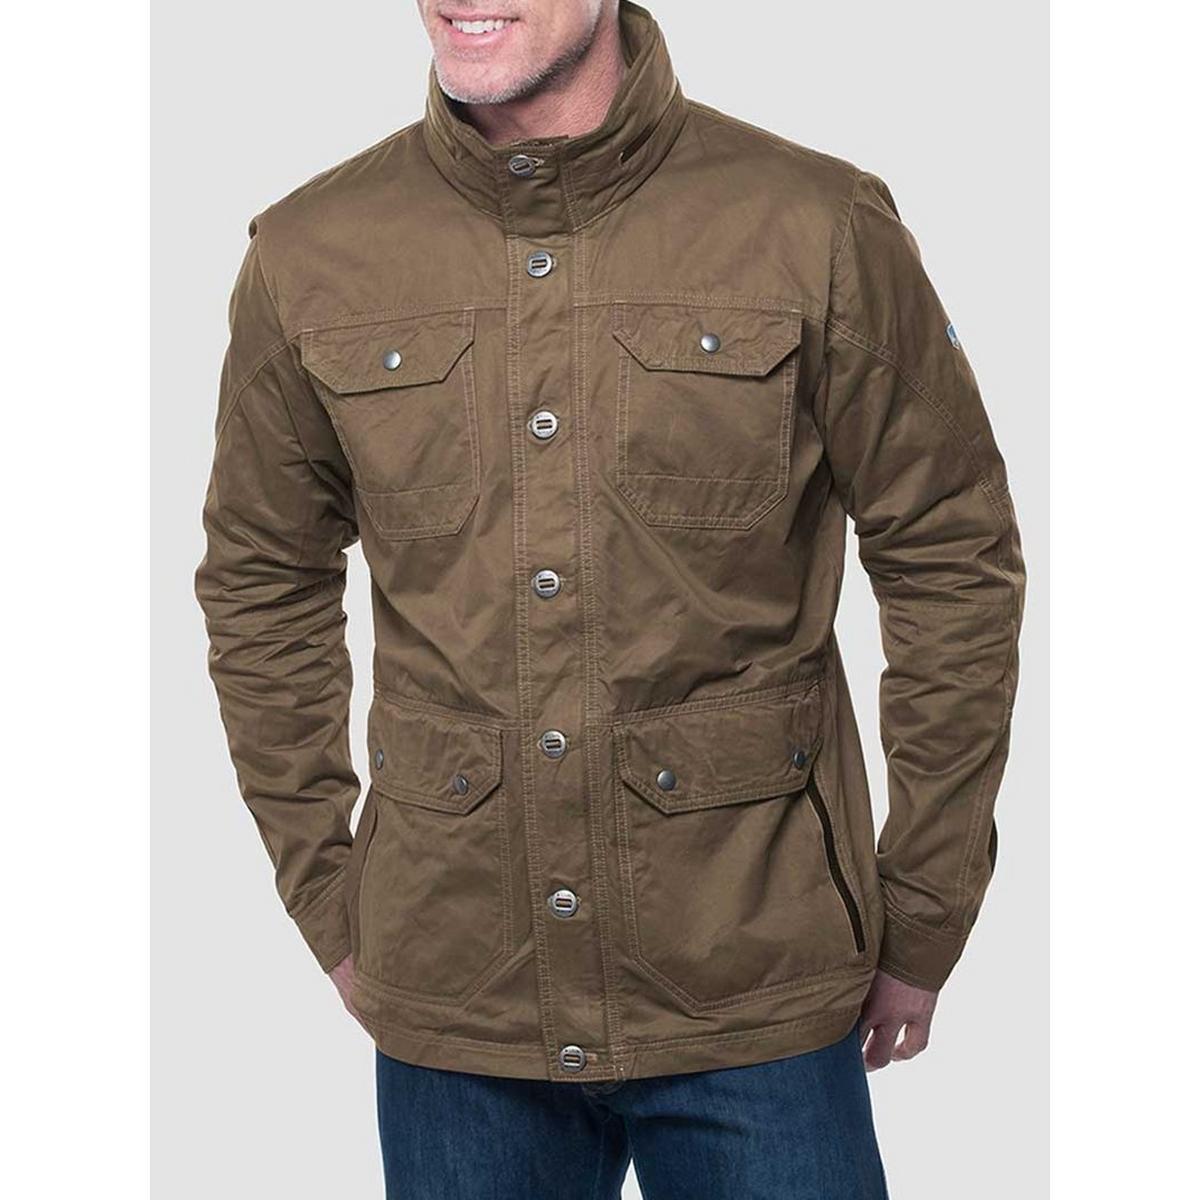 Kuhl Men's Kollusion Jacket - Dark Khaki